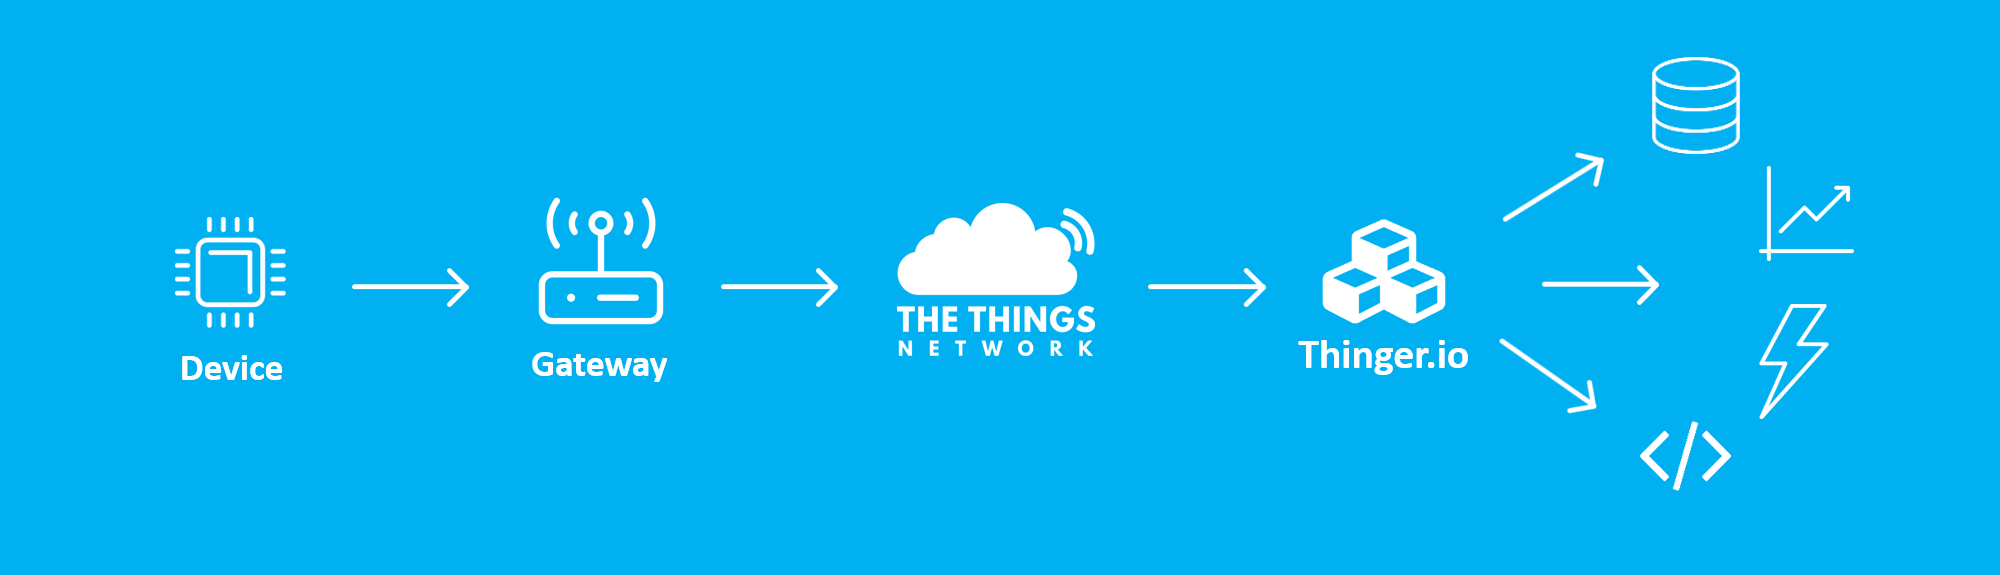 TheThingsNetwork & Thinger io IoT event! – Thinger io